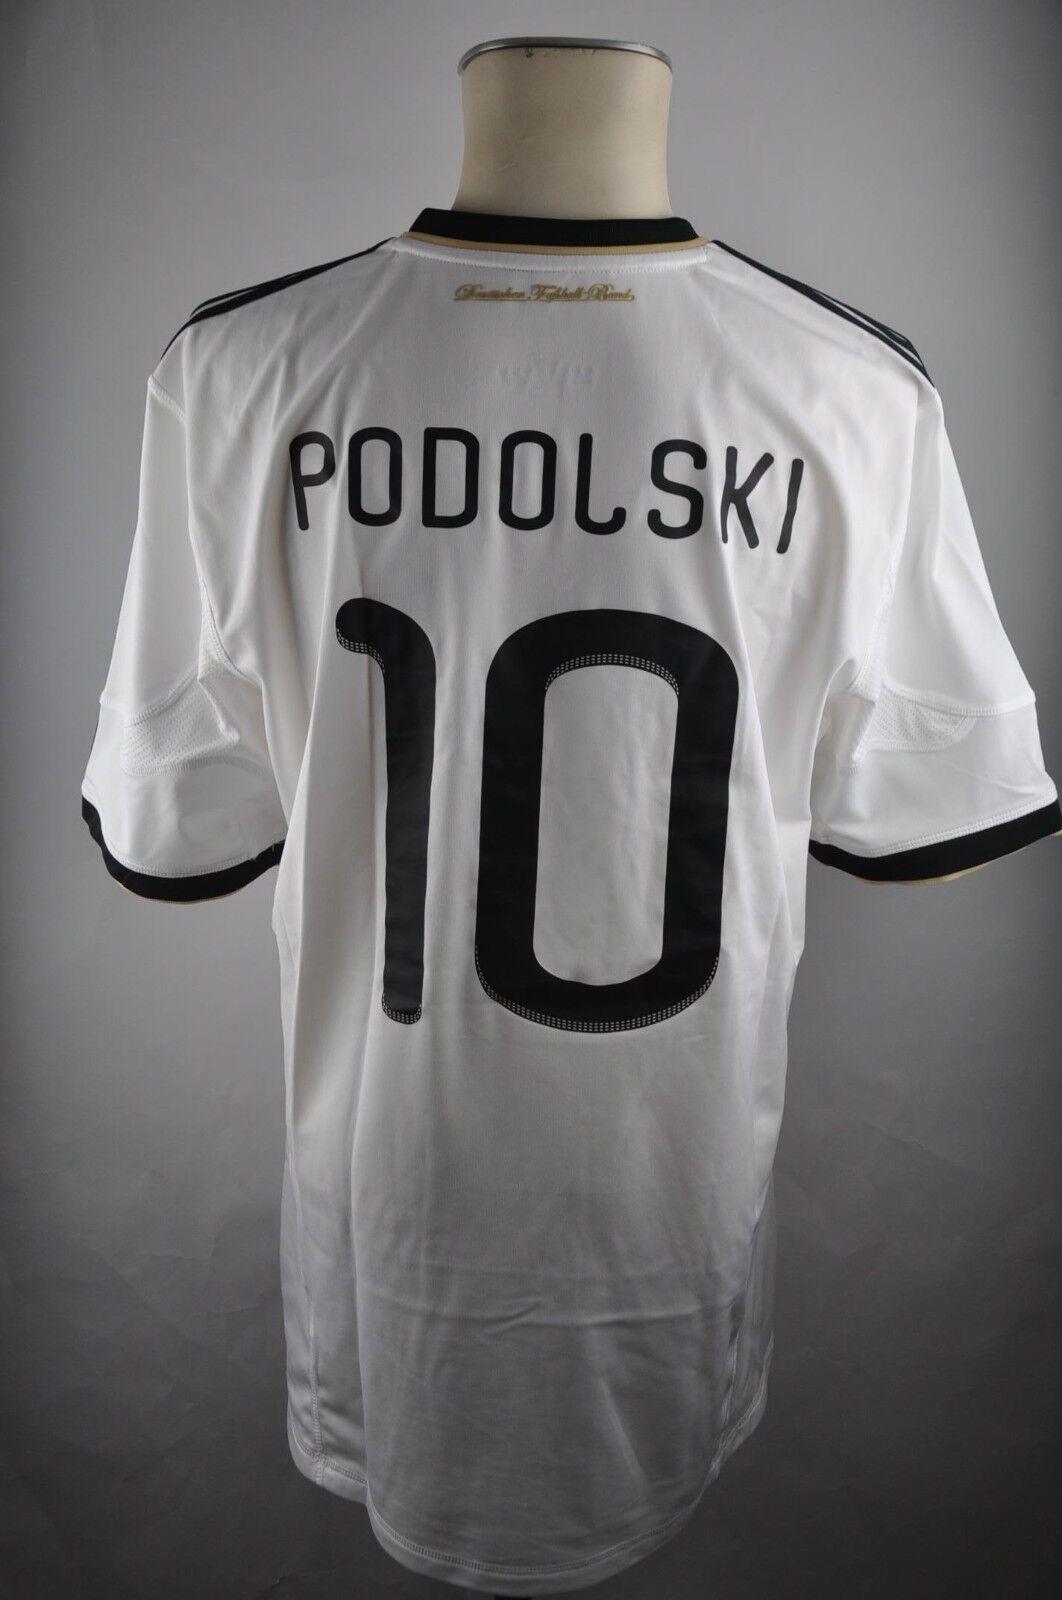 Germany DFB  10 Podolski Home Jersey Größe XL Adidas 2010 World Cup Shirt Germany